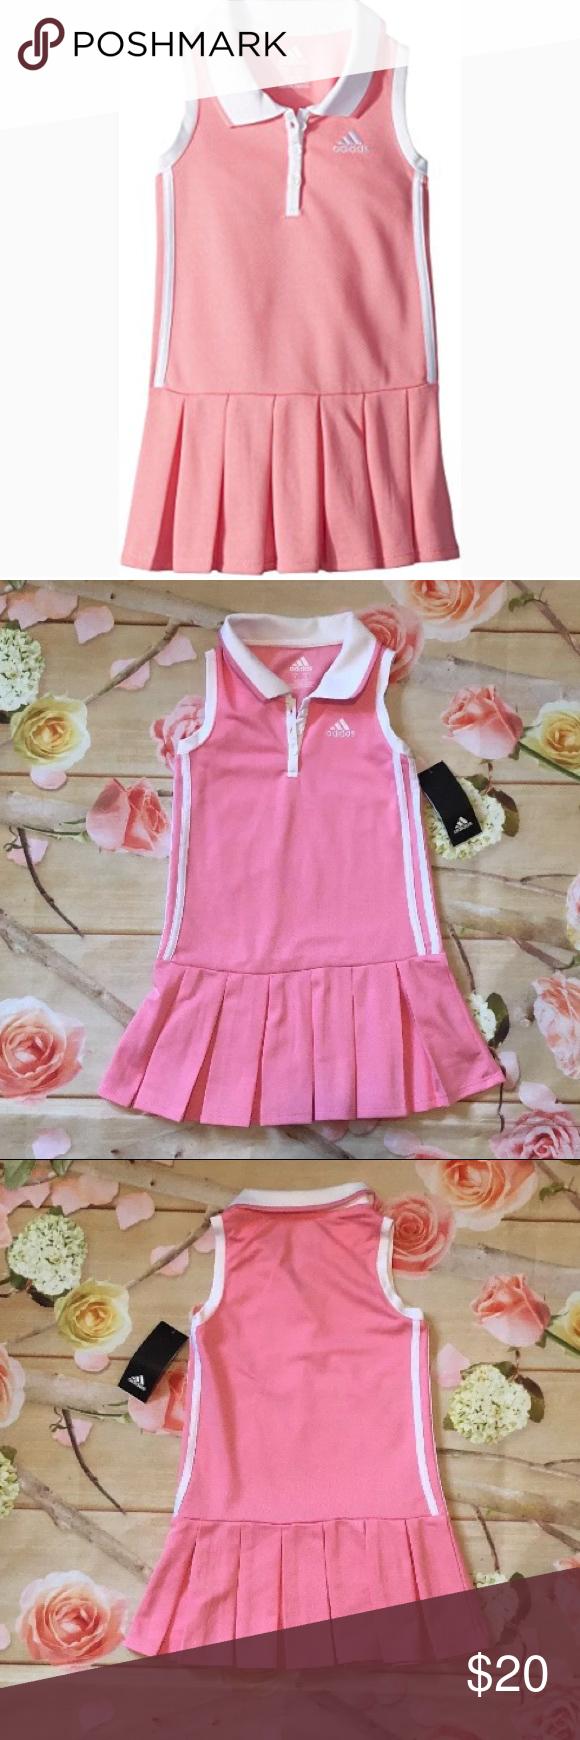 300769bdaa6 Adidas Kids Pink/White Twirl Polo Dress sz 5 girls Your little one twists  and